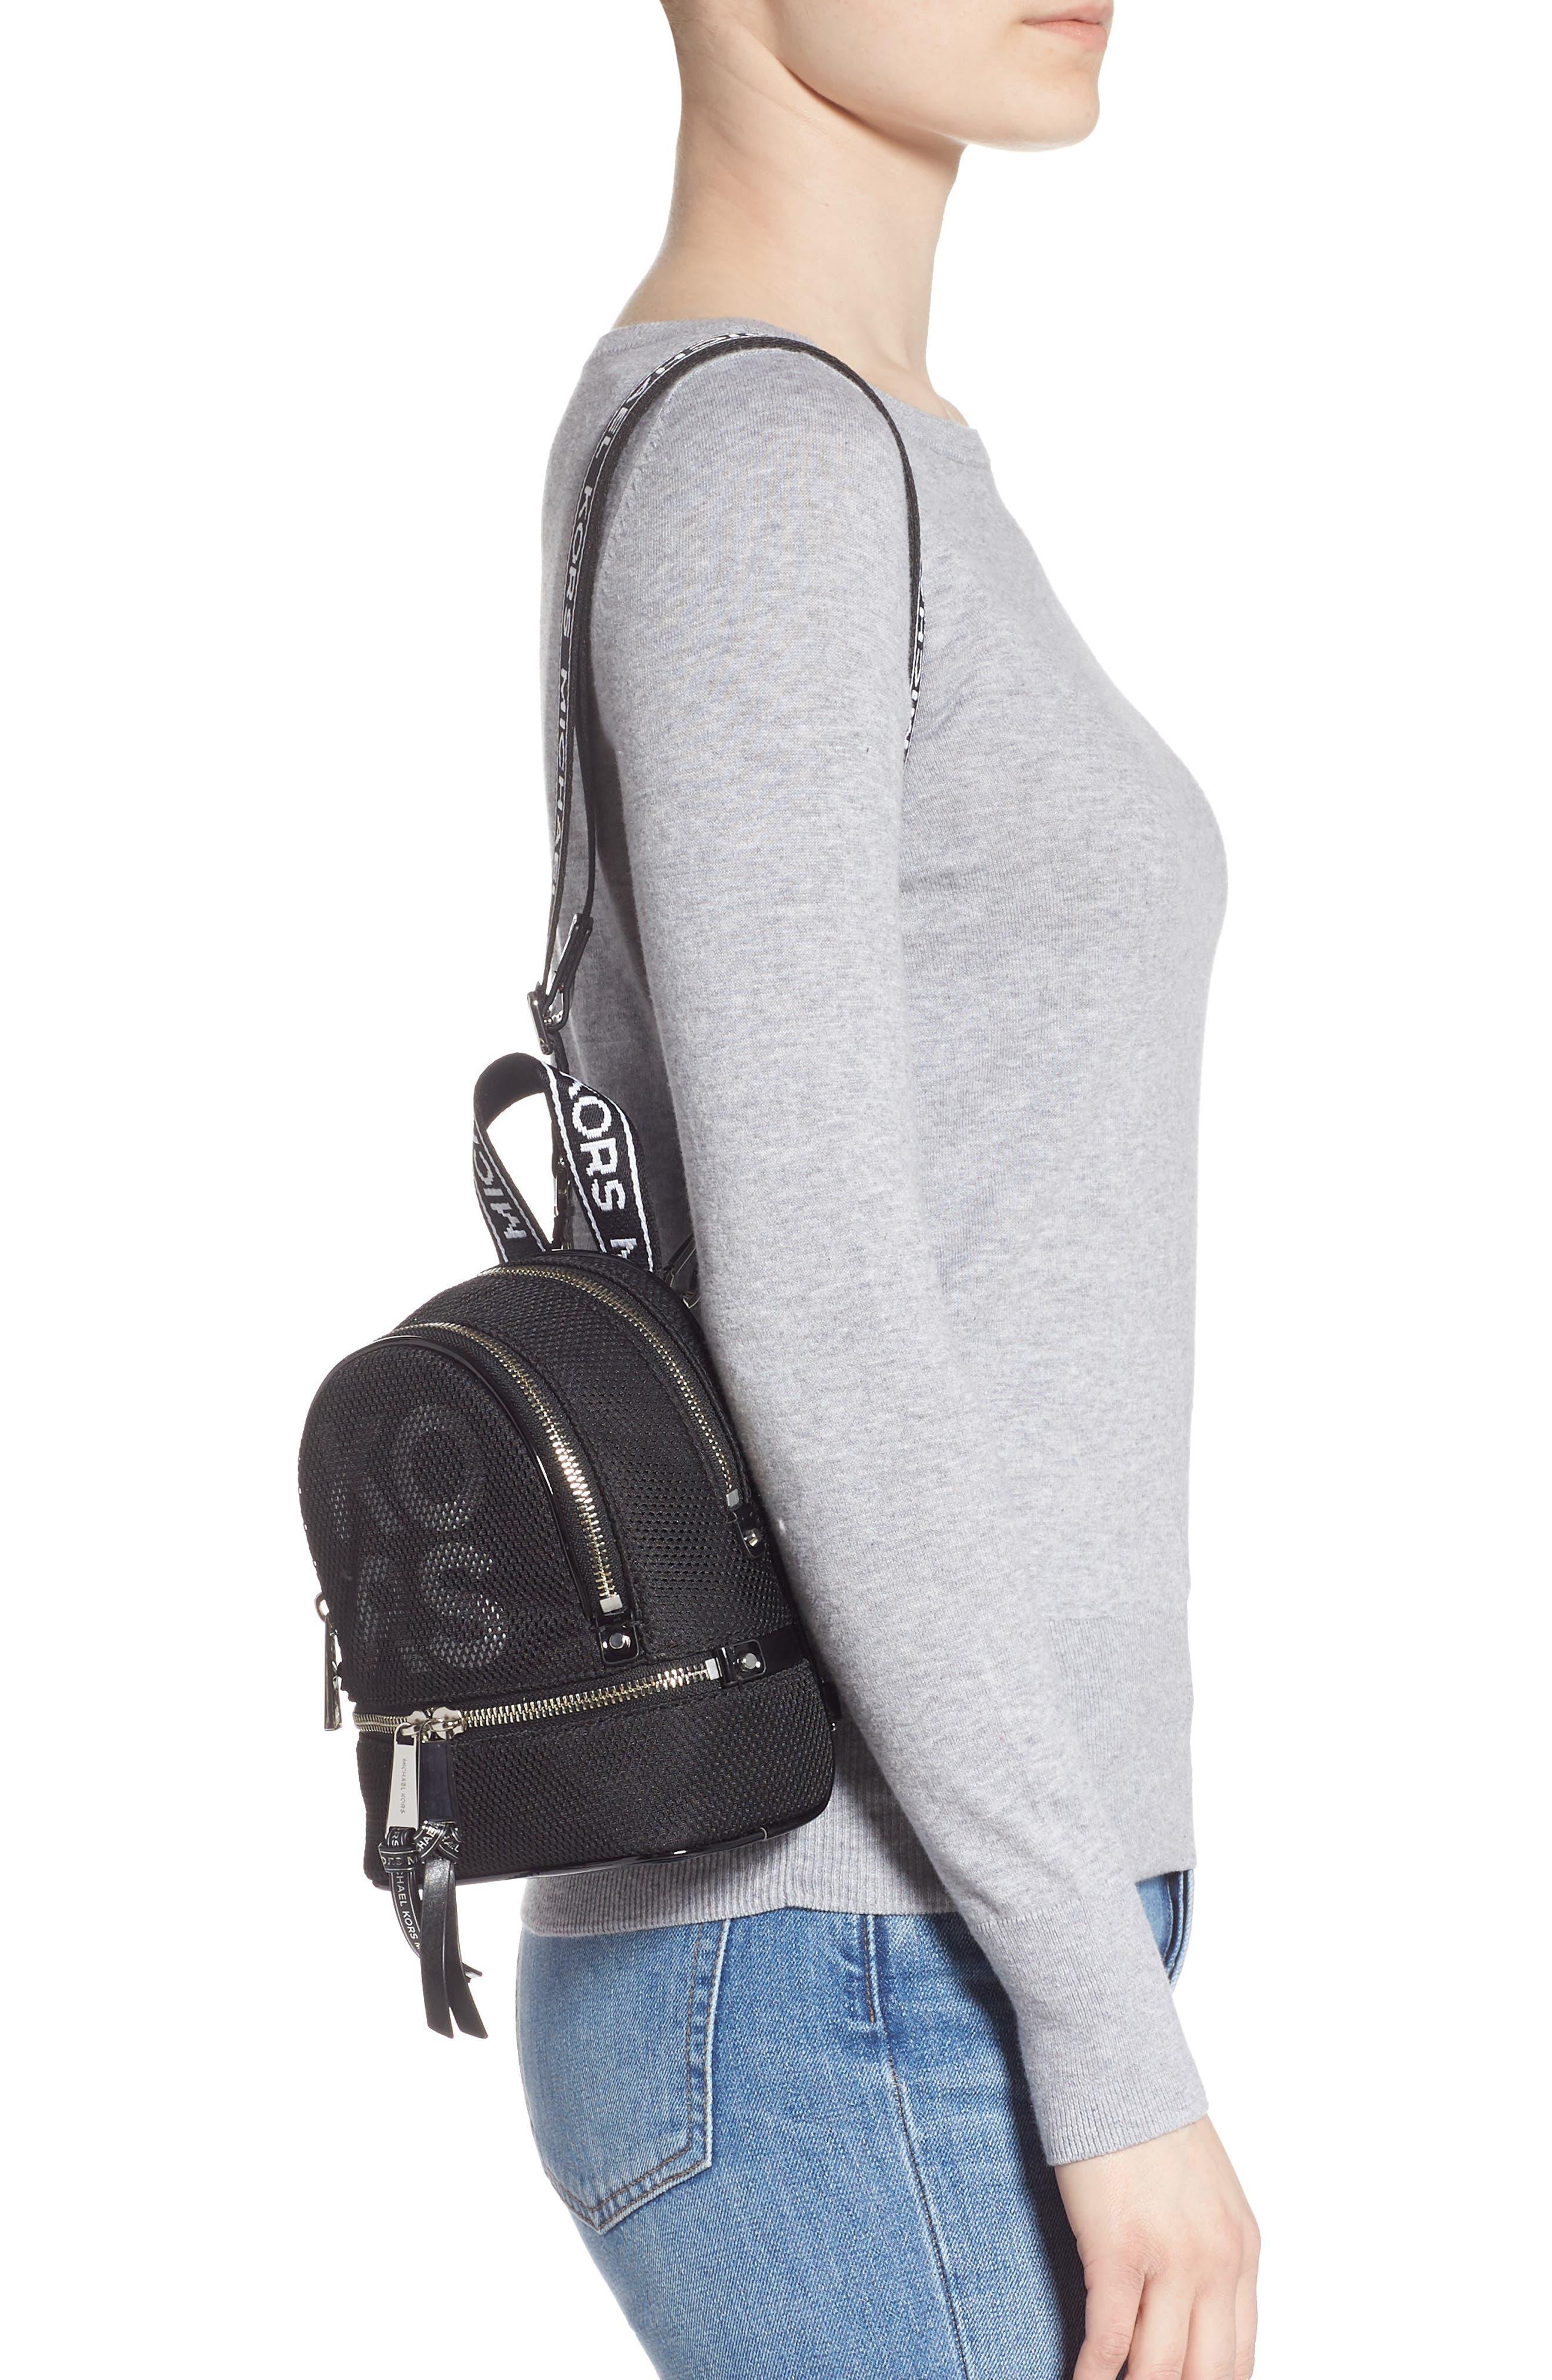 MICHAEL MICHAEL KORS, Extra Small Rhea Mesh Backpack, Alternate thumbnail 3, color, BLACK/ OPTIC WHITE